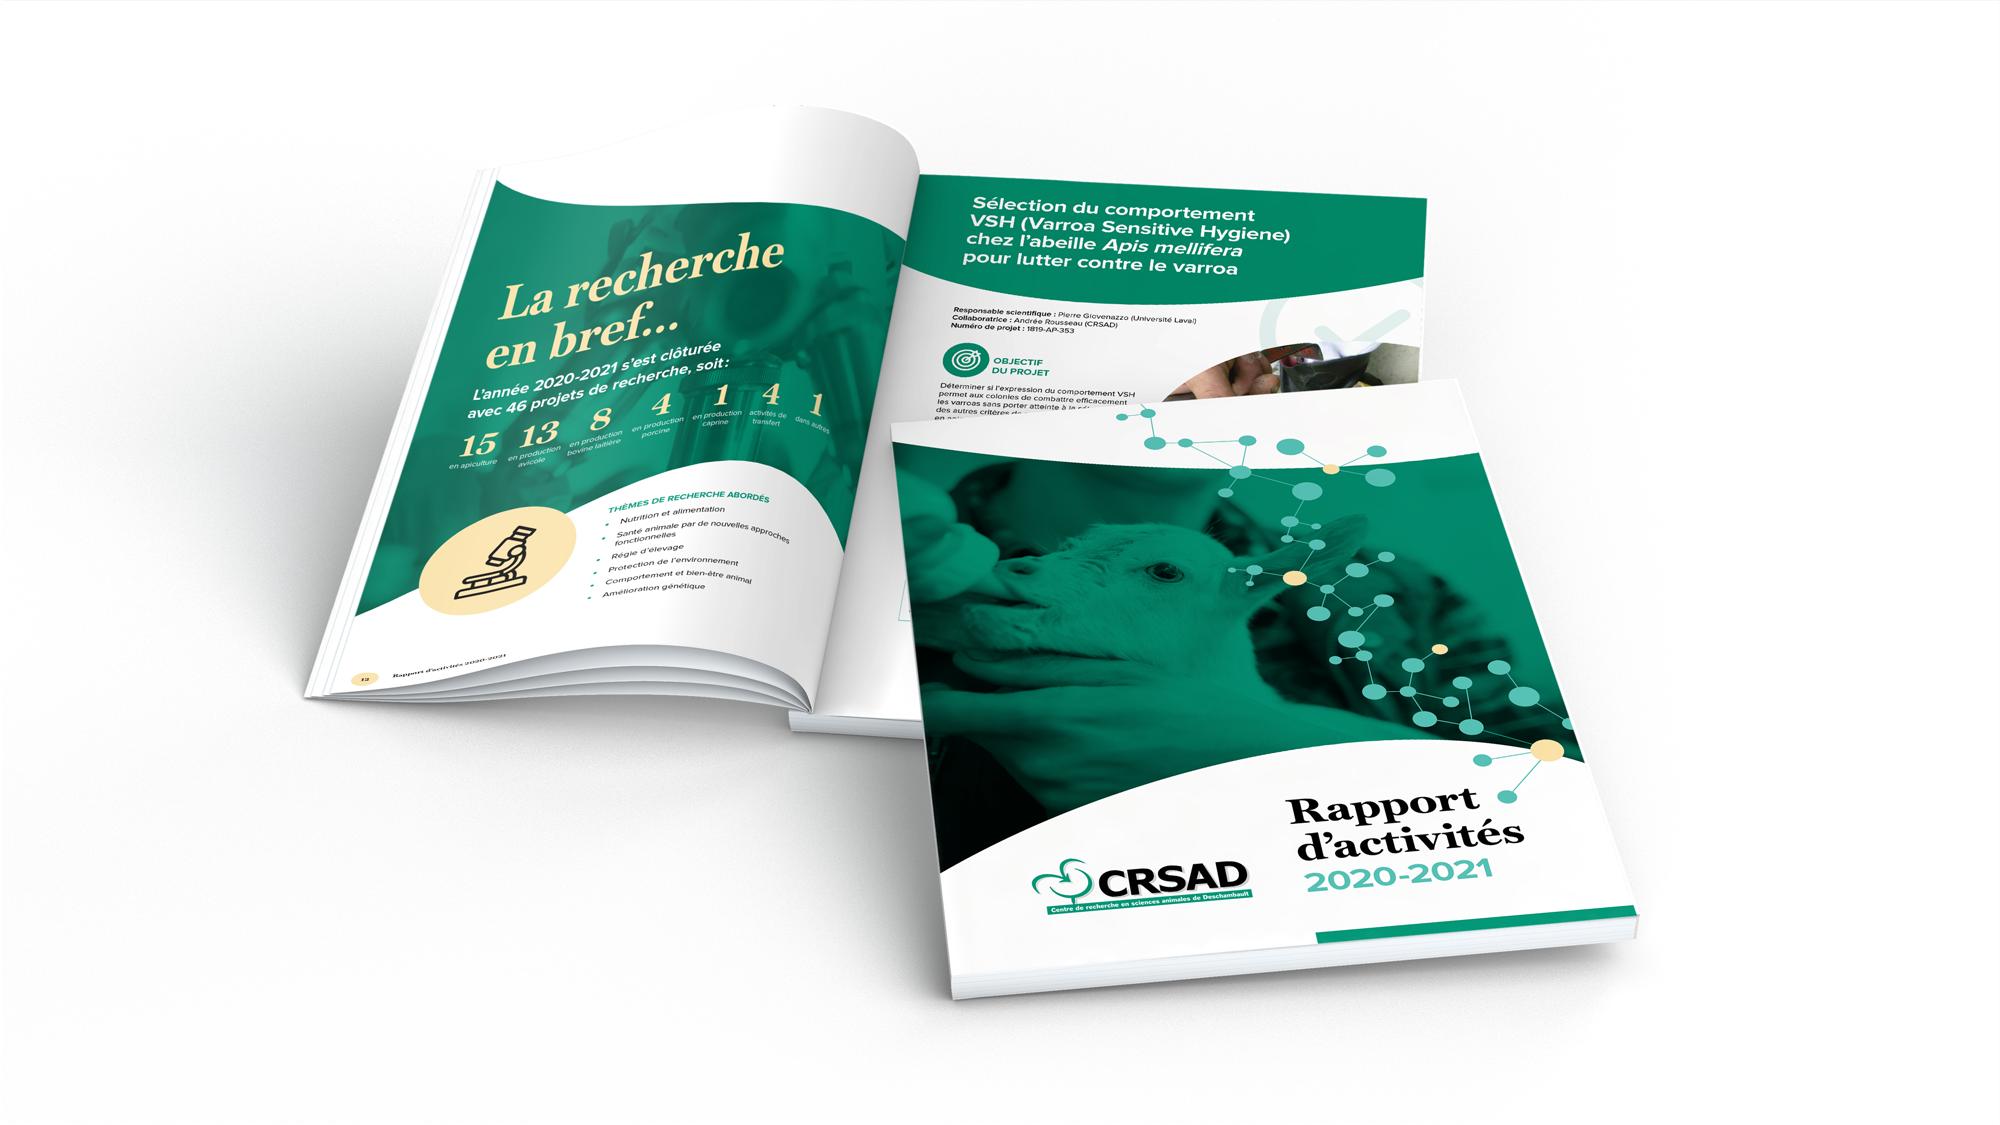 Rapport annuel CRSAD